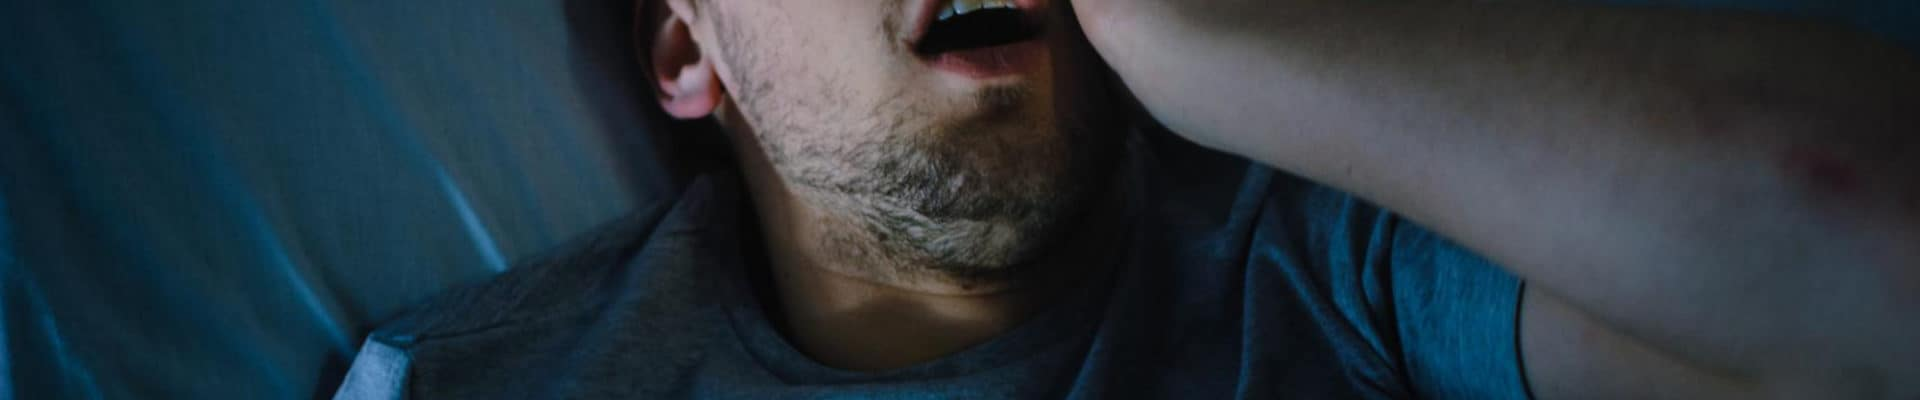 A man lies awake and scared to go to sleep.